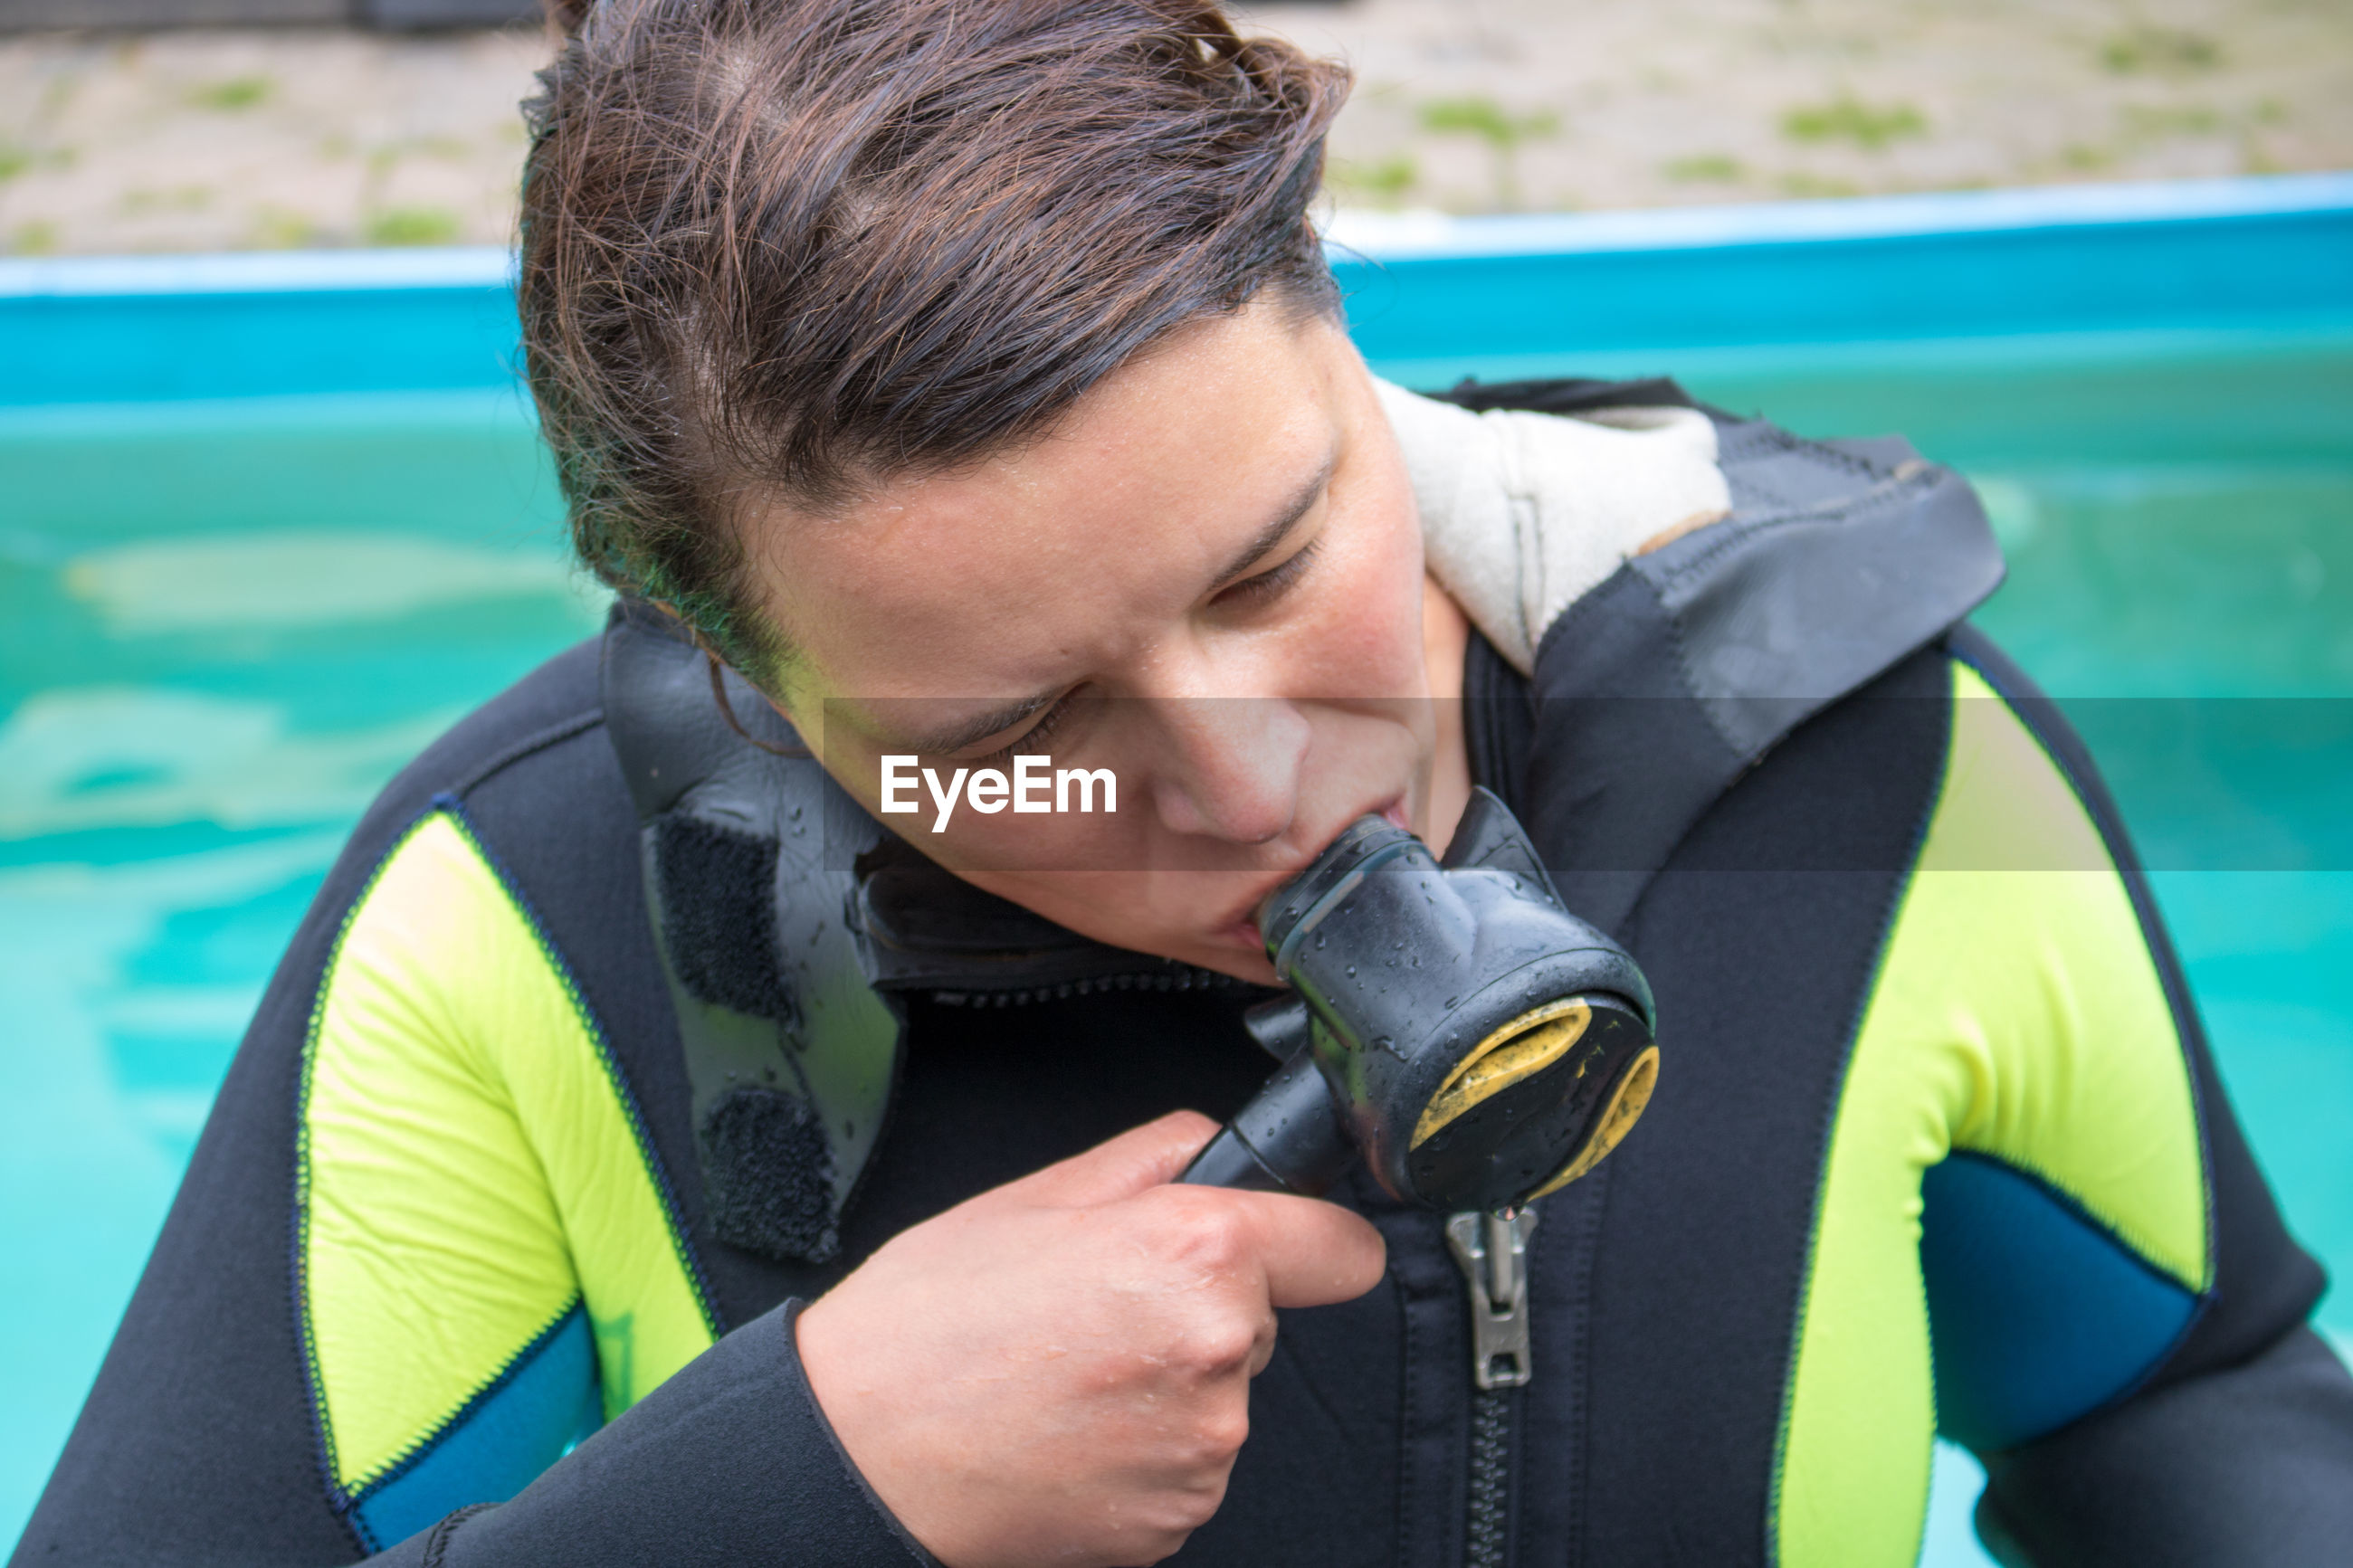 Woman checking aqualung at poolside